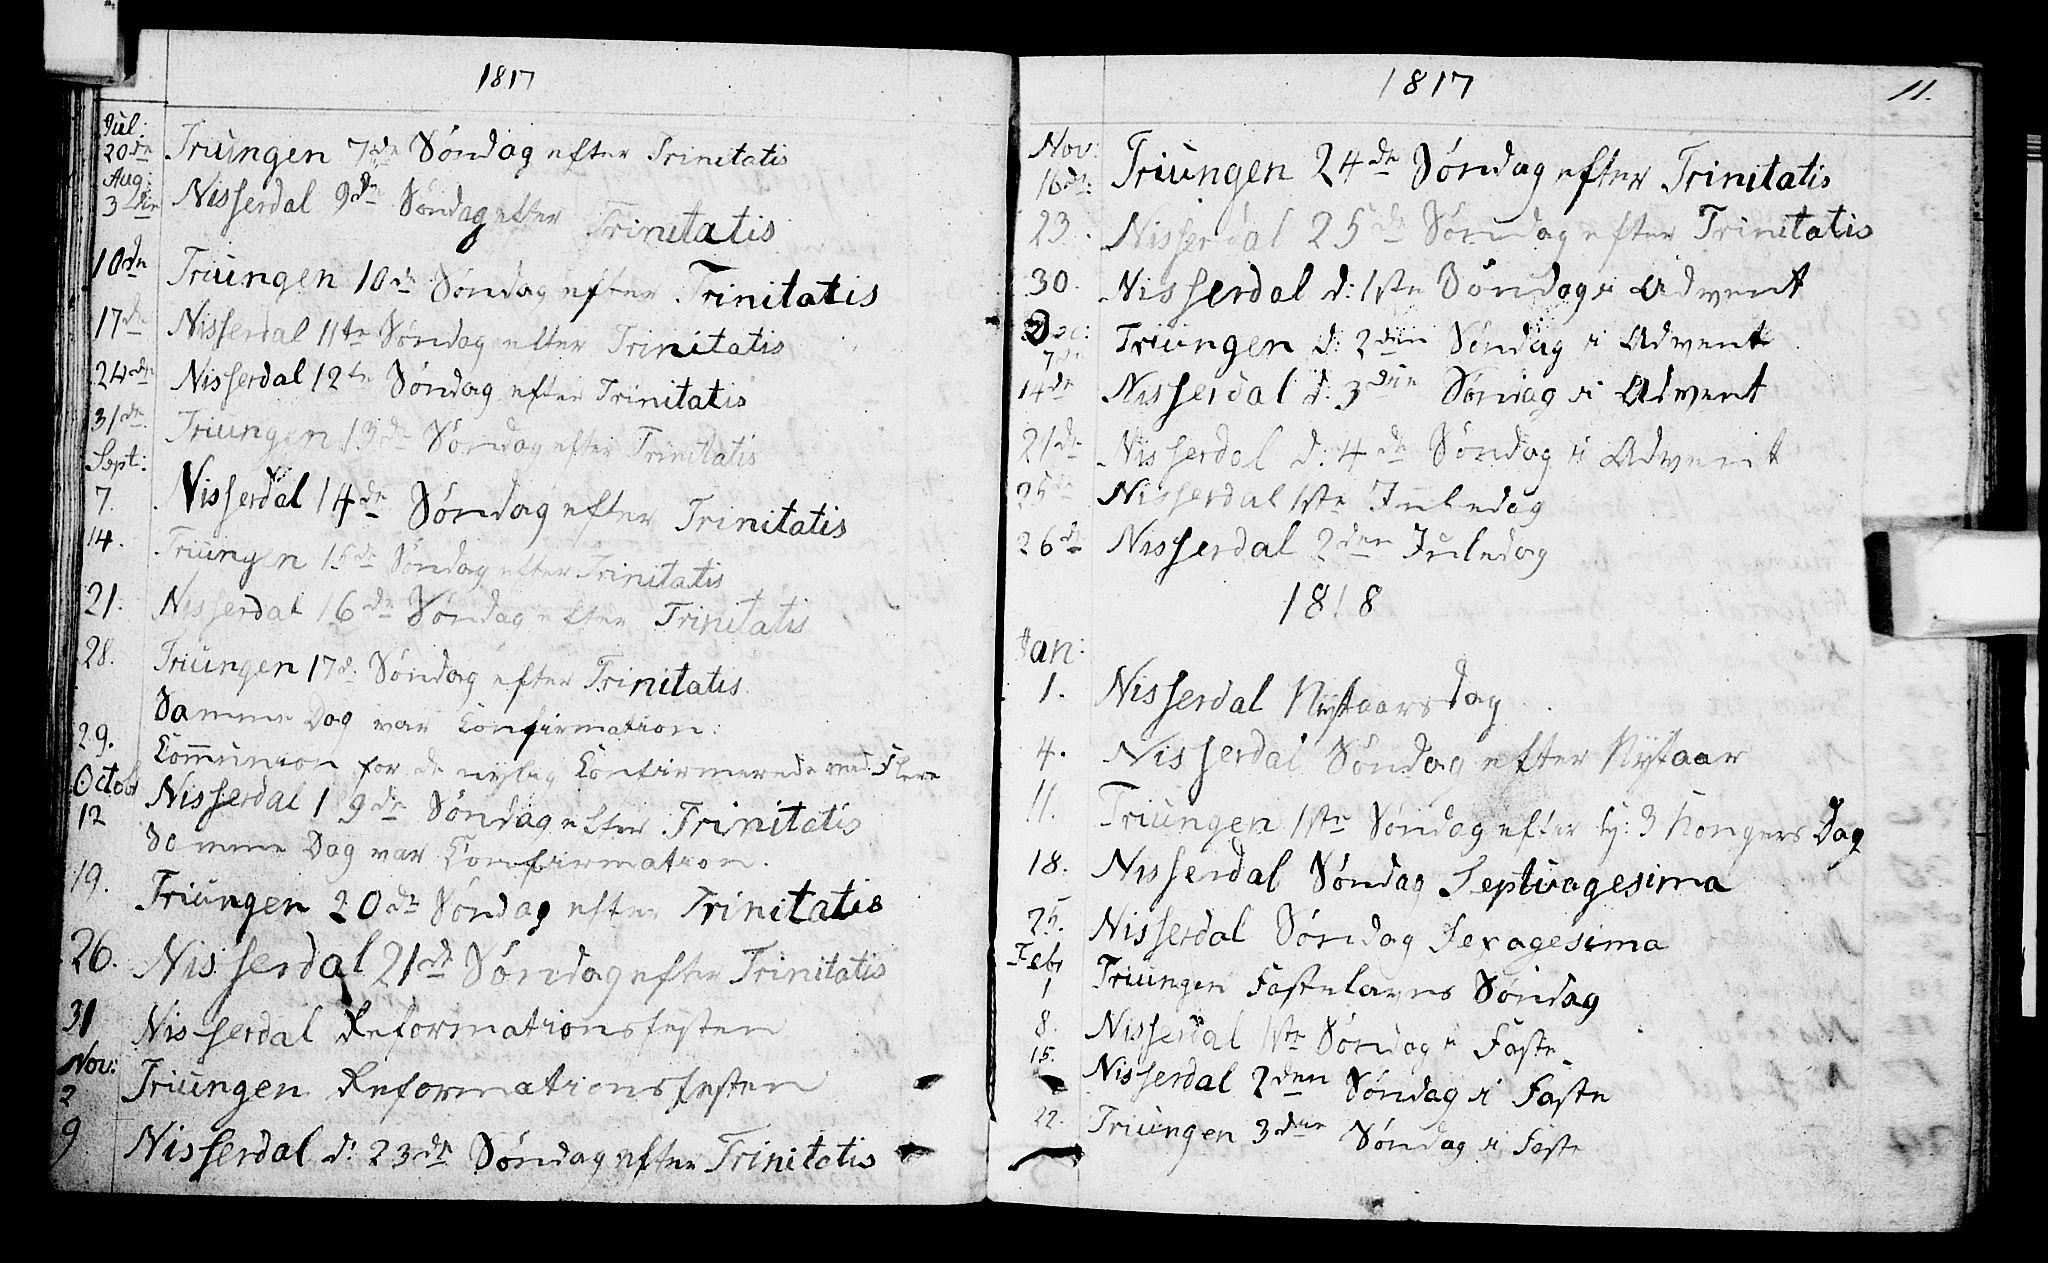 SAKO, Nissedal kirkebøker, F/Fa/L0001: Ministerialbok nr. I 1, 1811-1814, s. 11